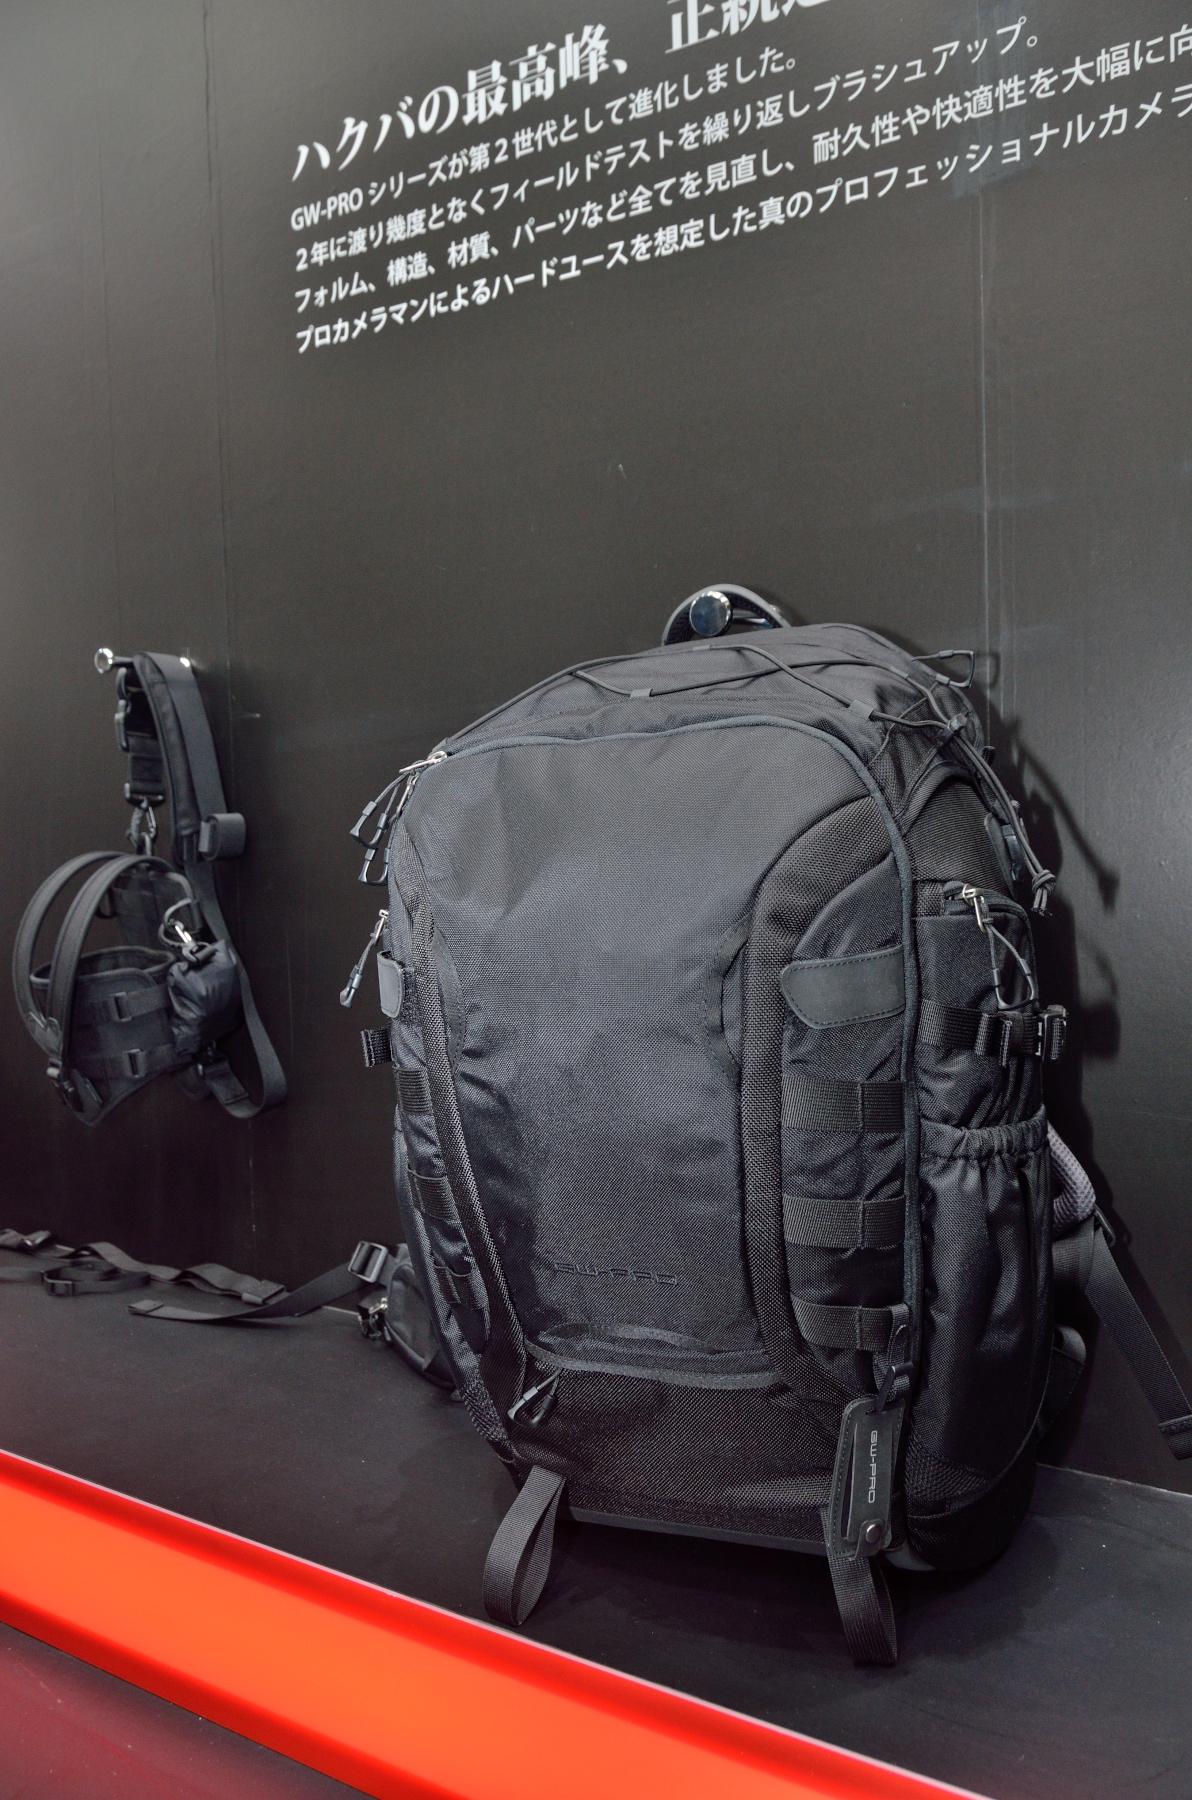 GW-PROバックパックG2と同カメラホルスターG2